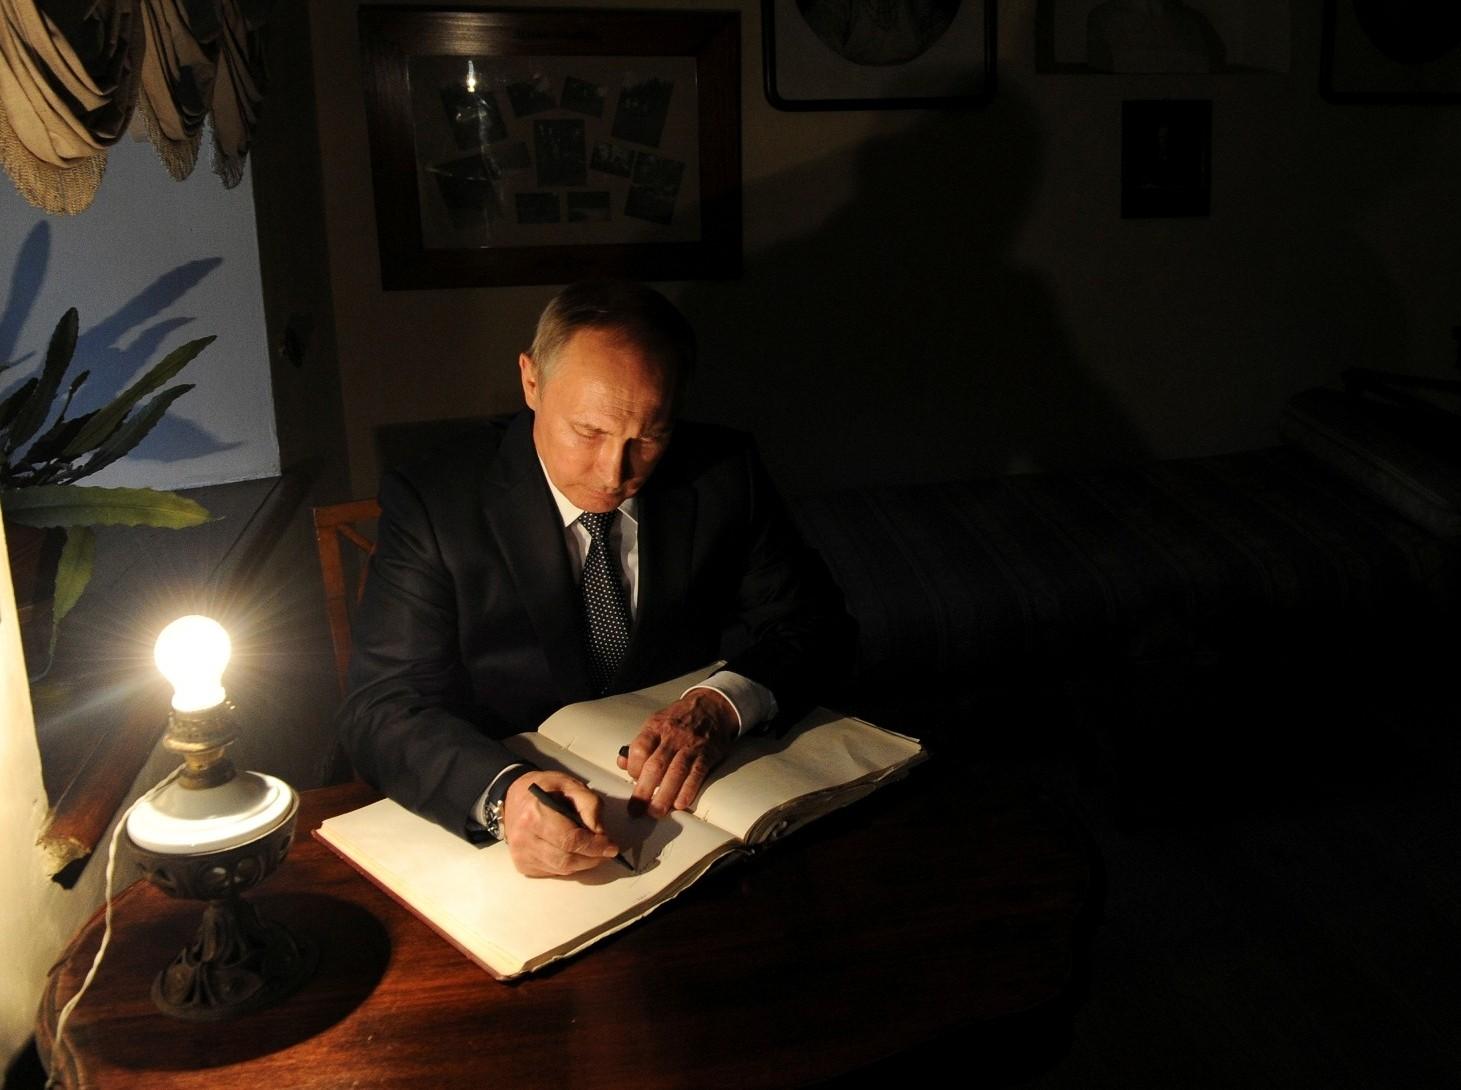 Putin writing